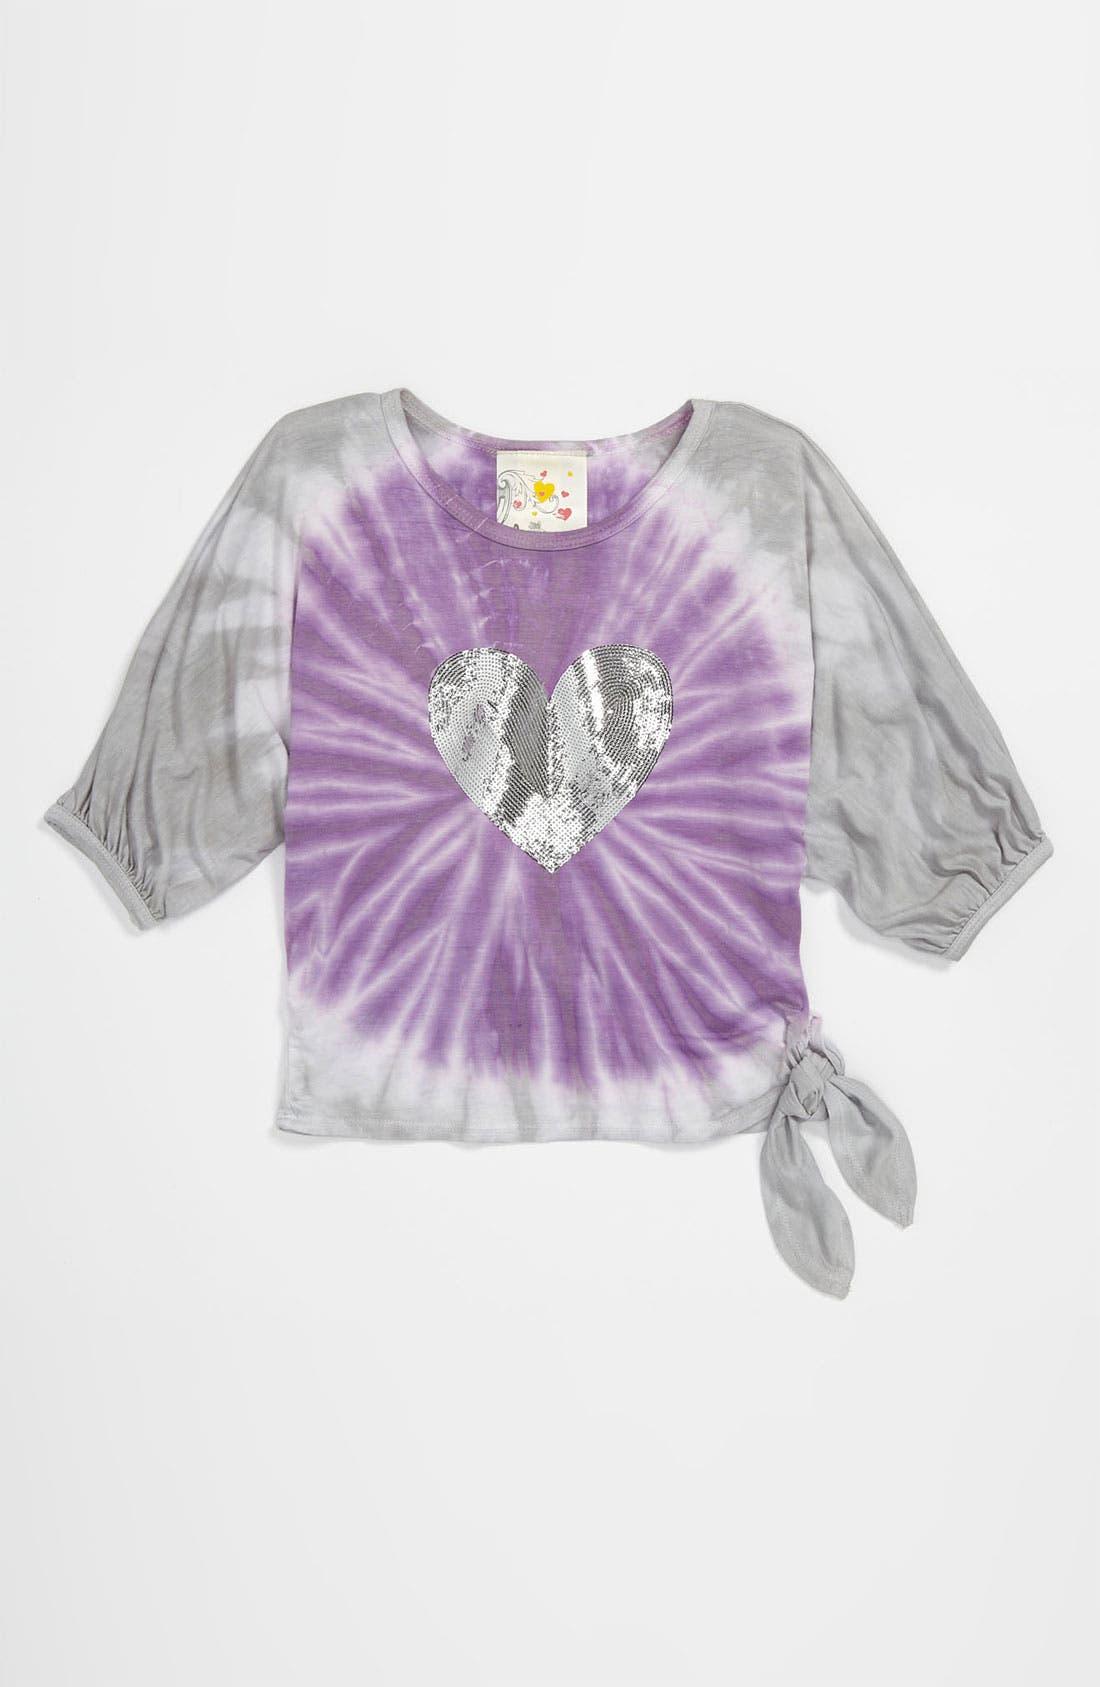 Alternate Image 1 Selected - Jenna & Jessie Sequin Heart Tee (Little Girls)